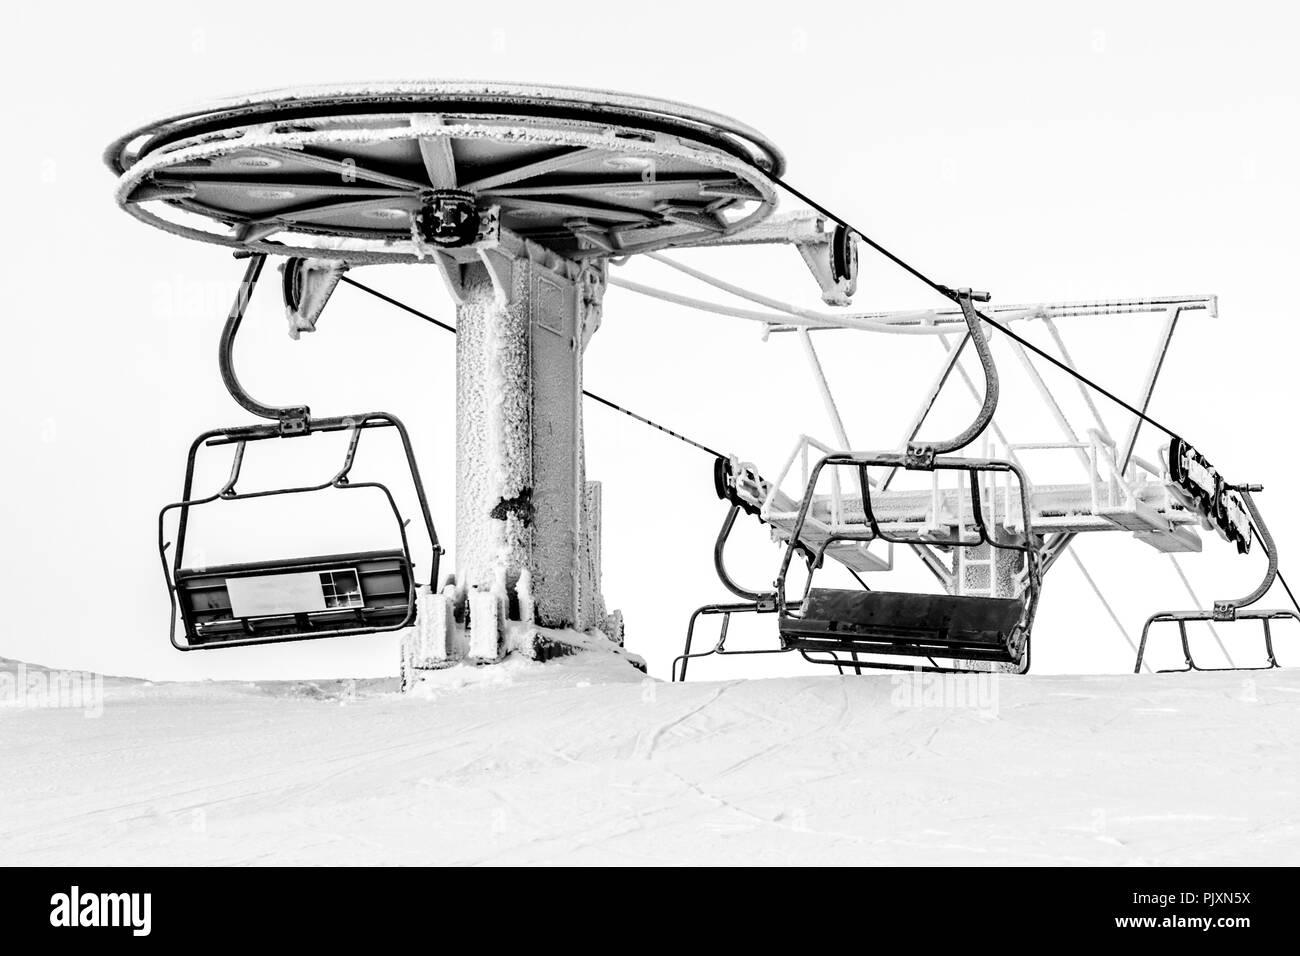 Ski Lift In Freezing Day Ruka Ski Resort Finland Stock Photo Alamy